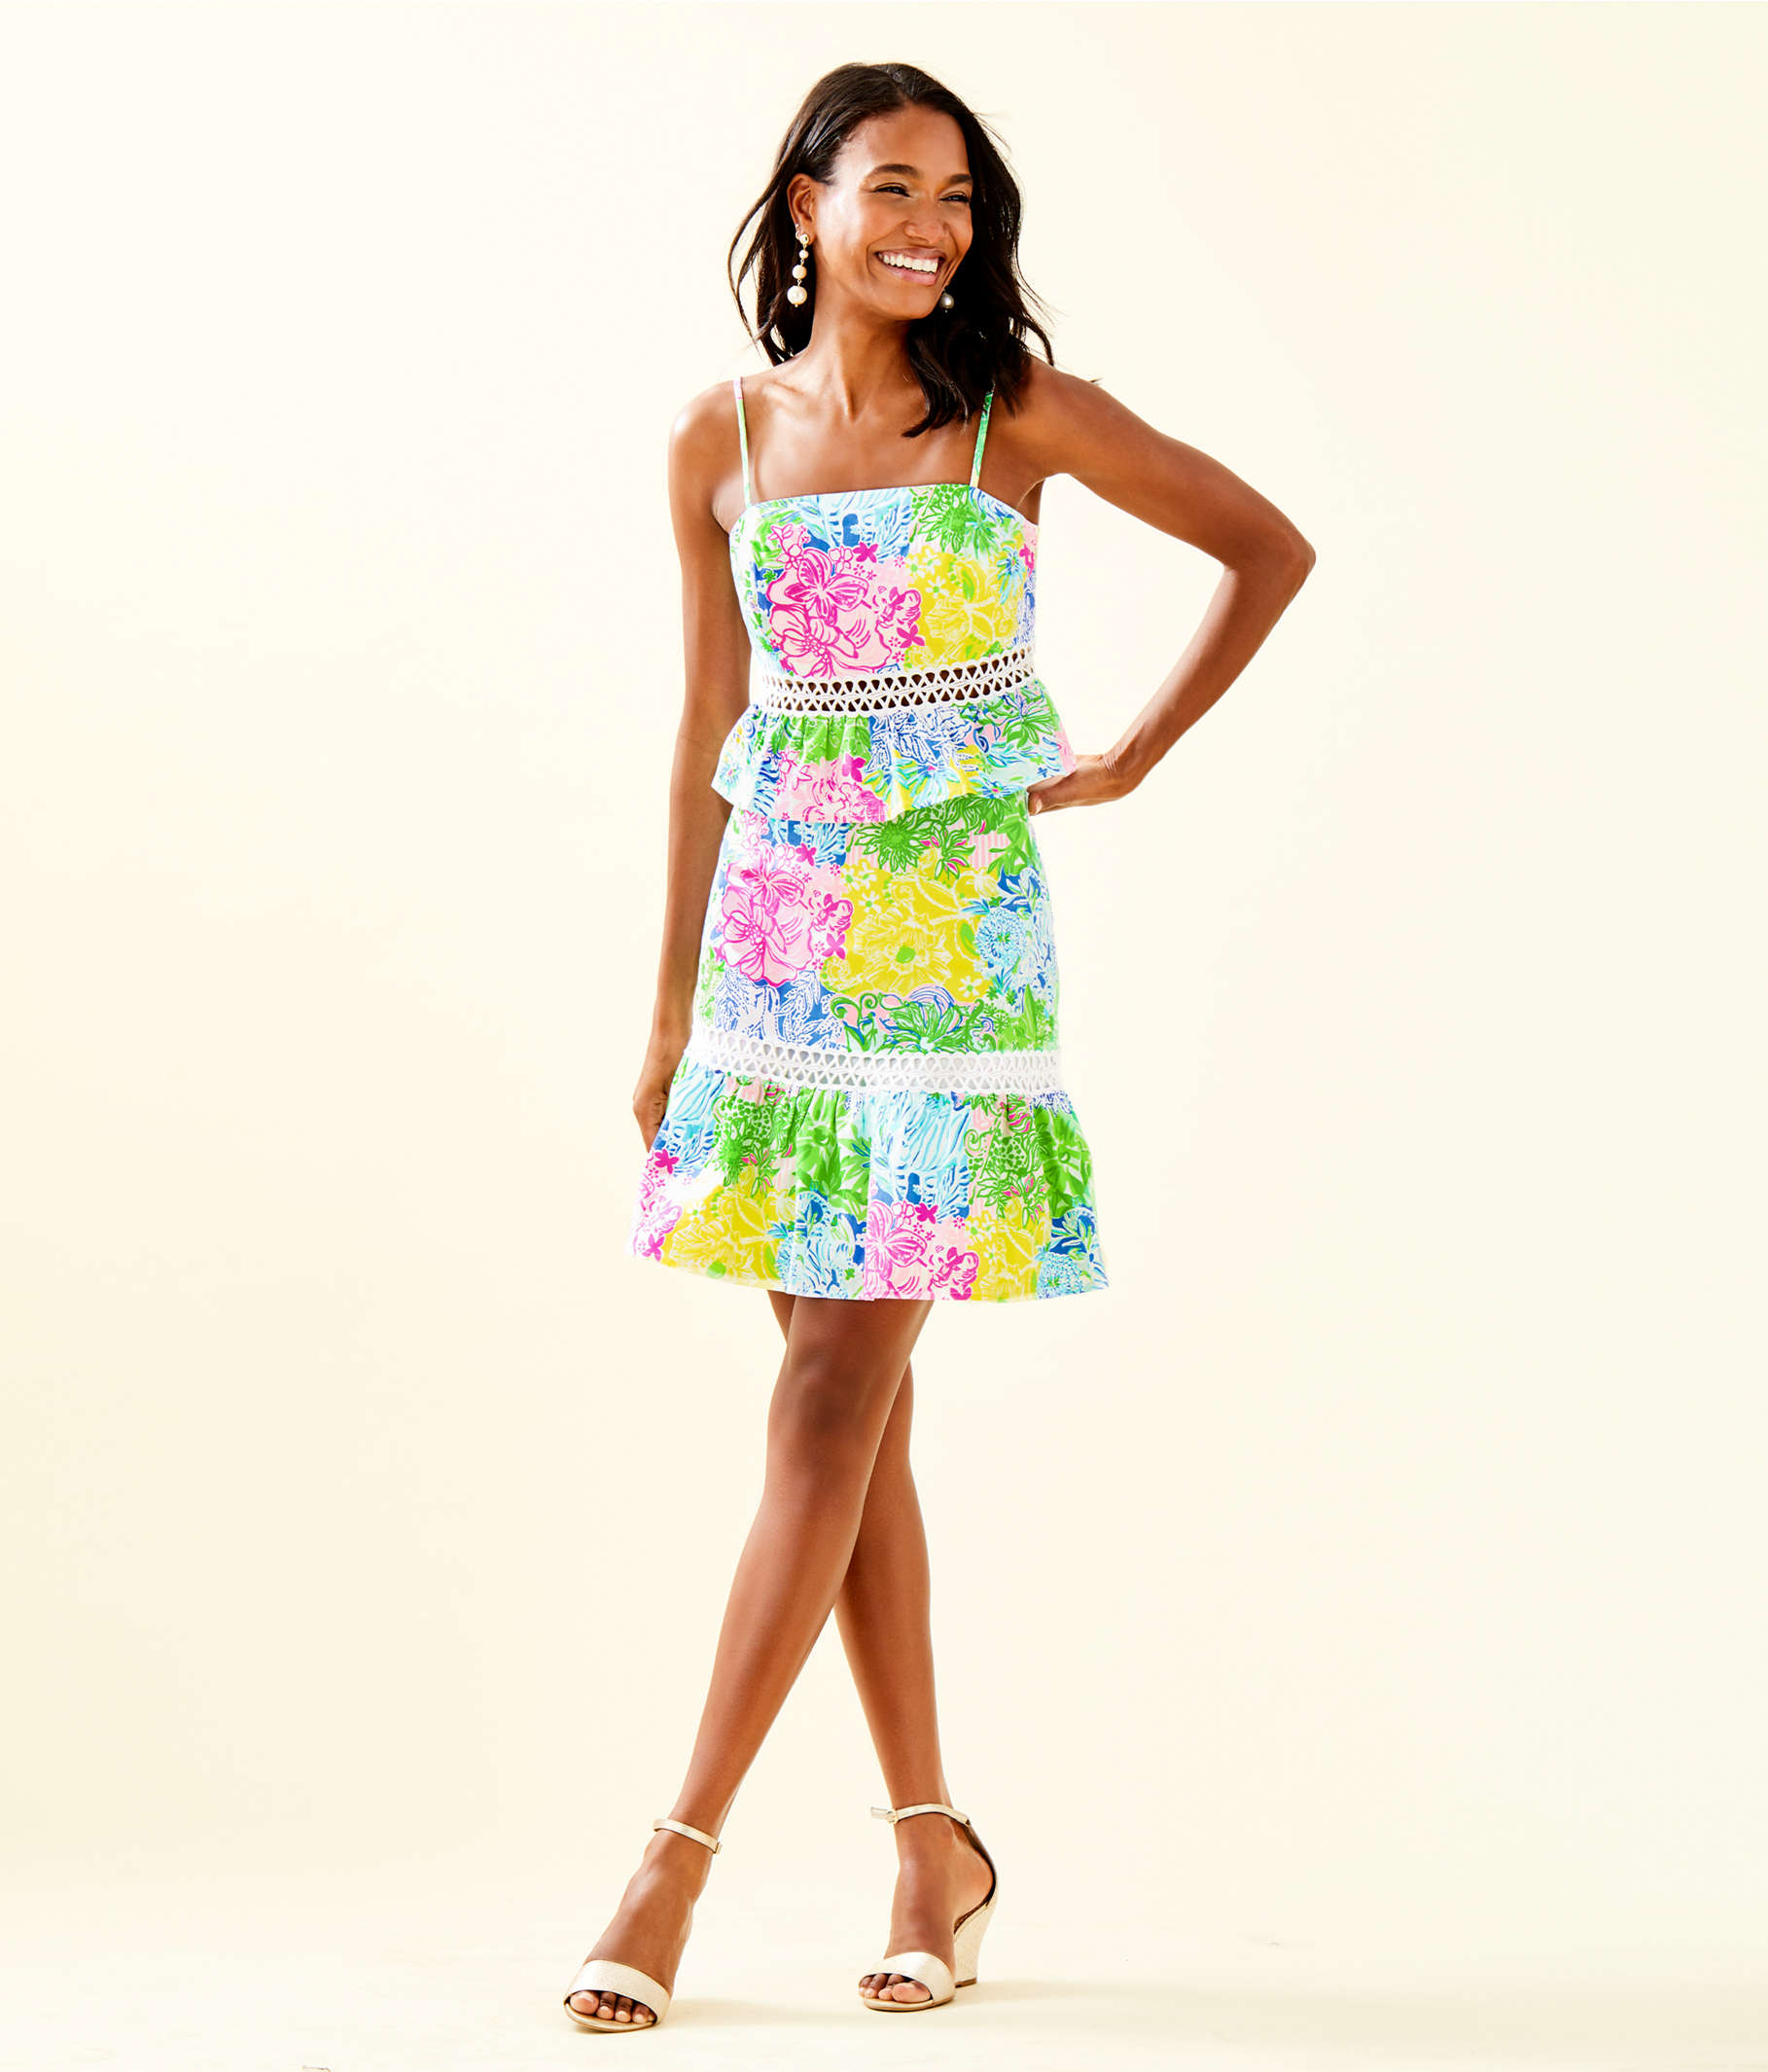 c8183bb63e5649 Peplum Tops With Skirts